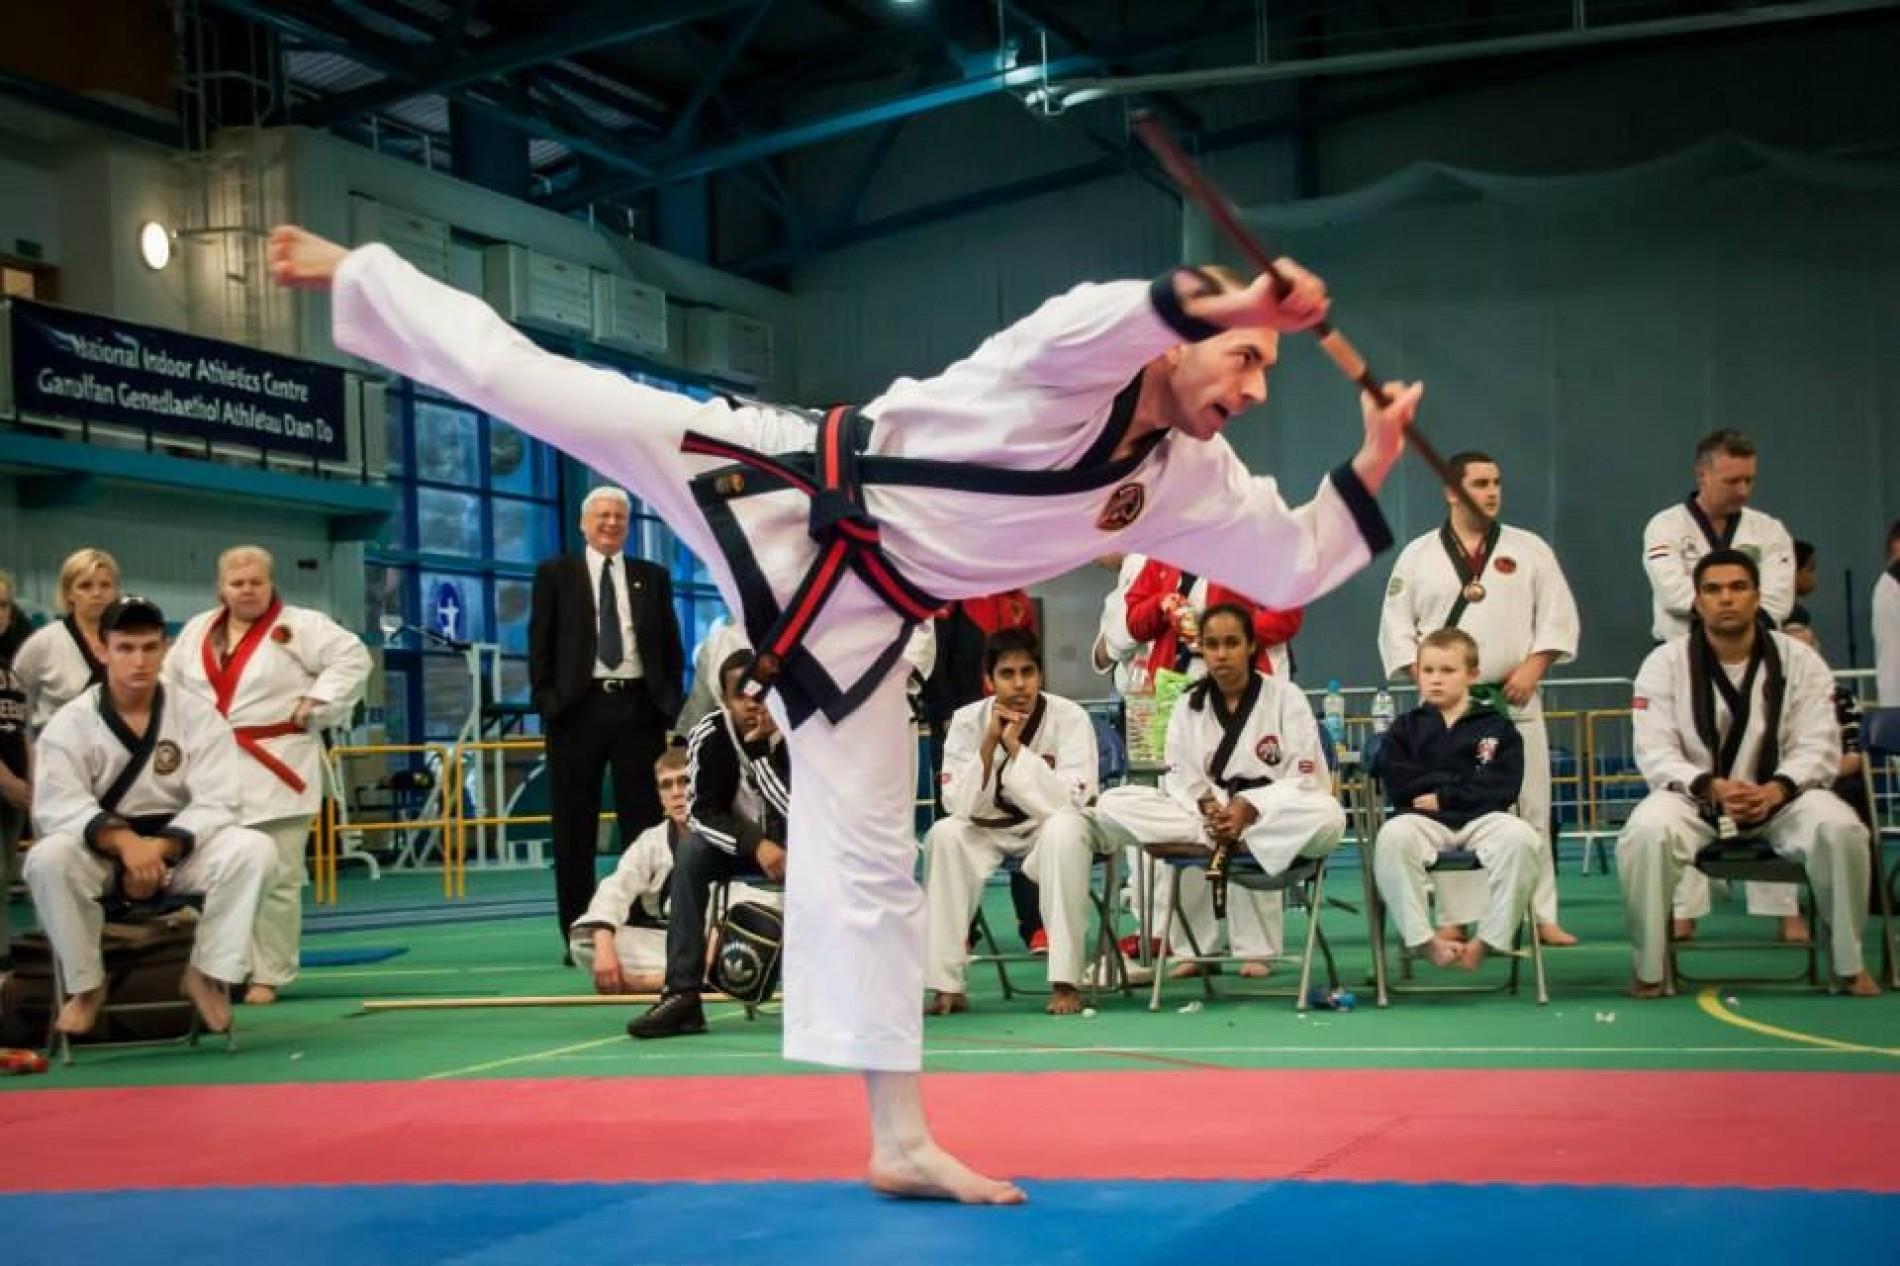 Master Michael Campagnini